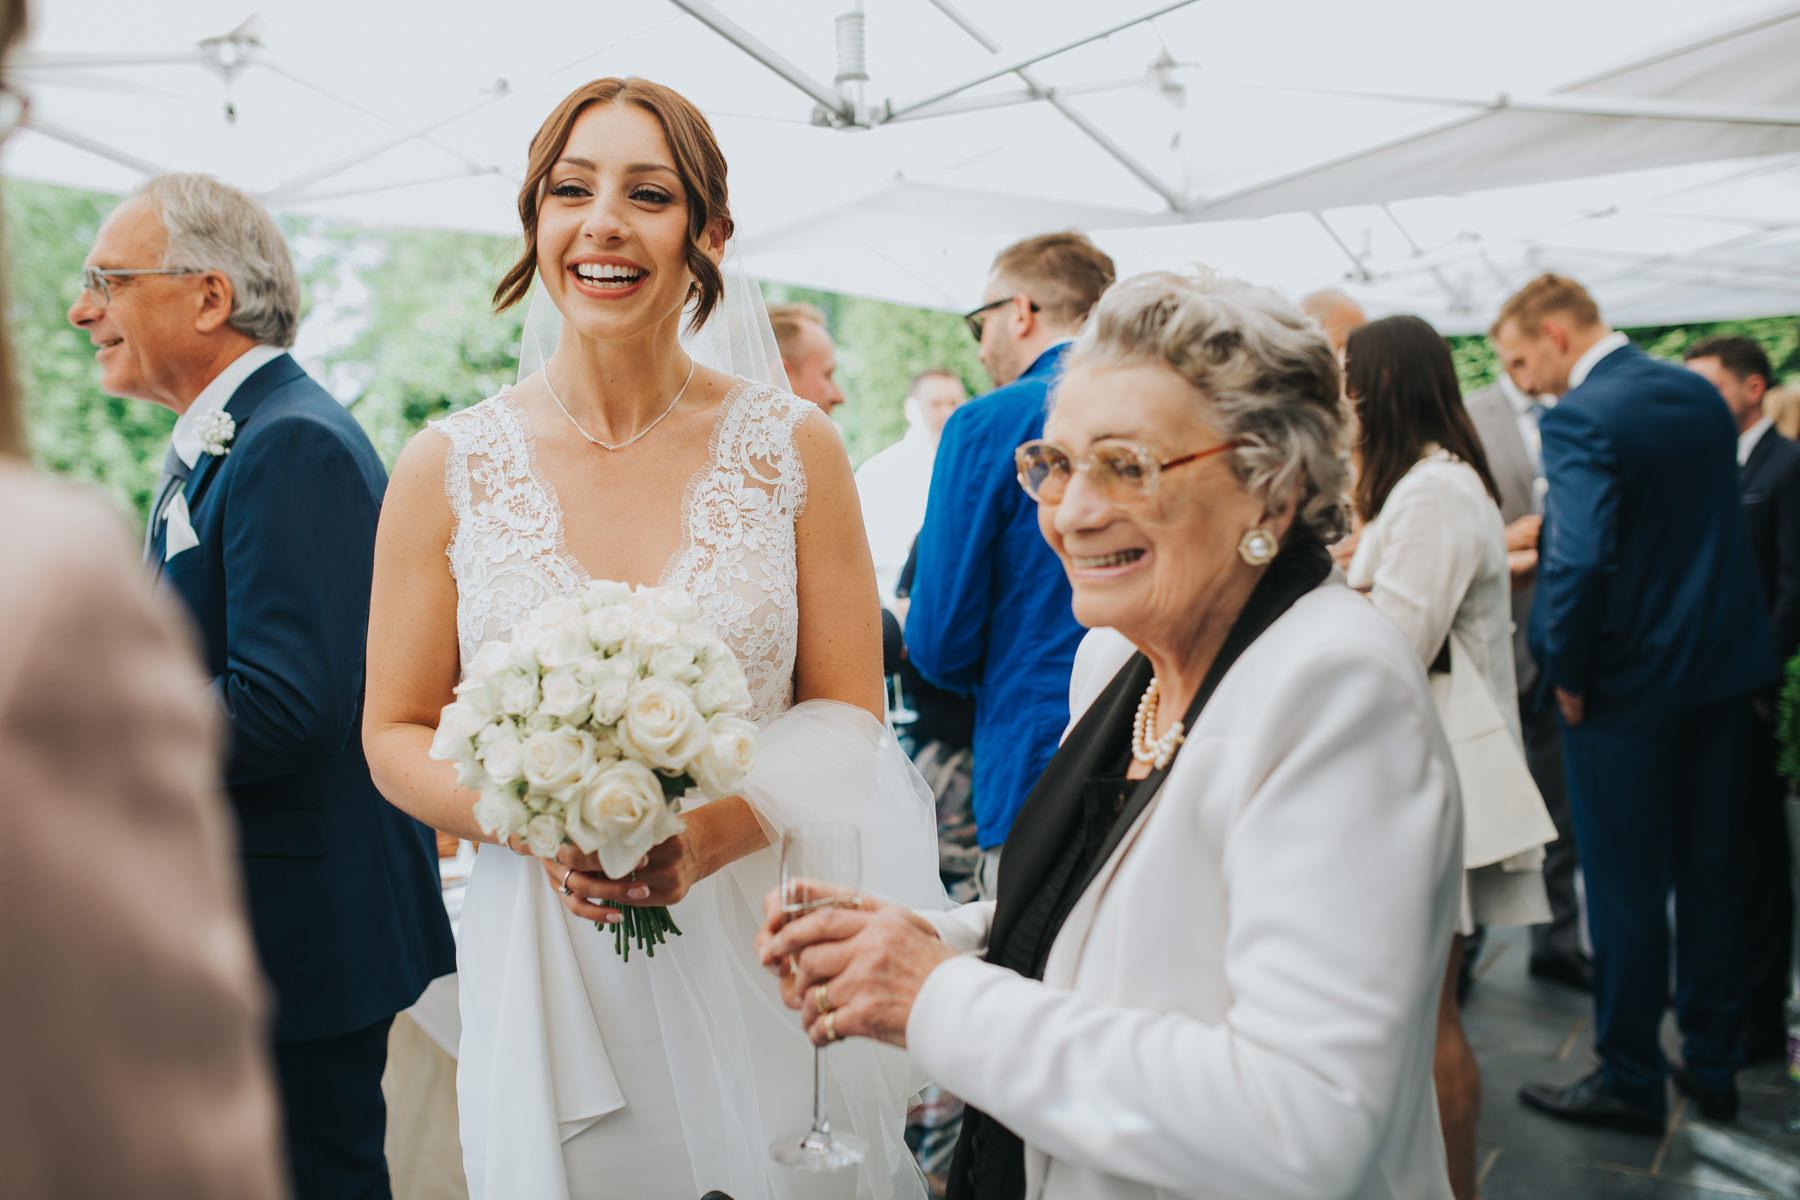 CRL-290-The Bingham wedding Richmond-bride grandmother embrace.jpg